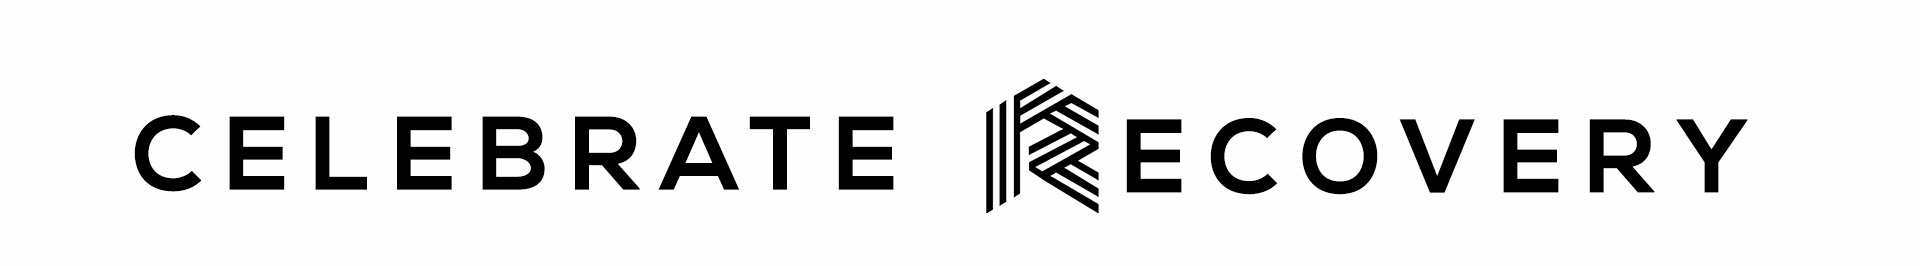 cr-logo.jpg